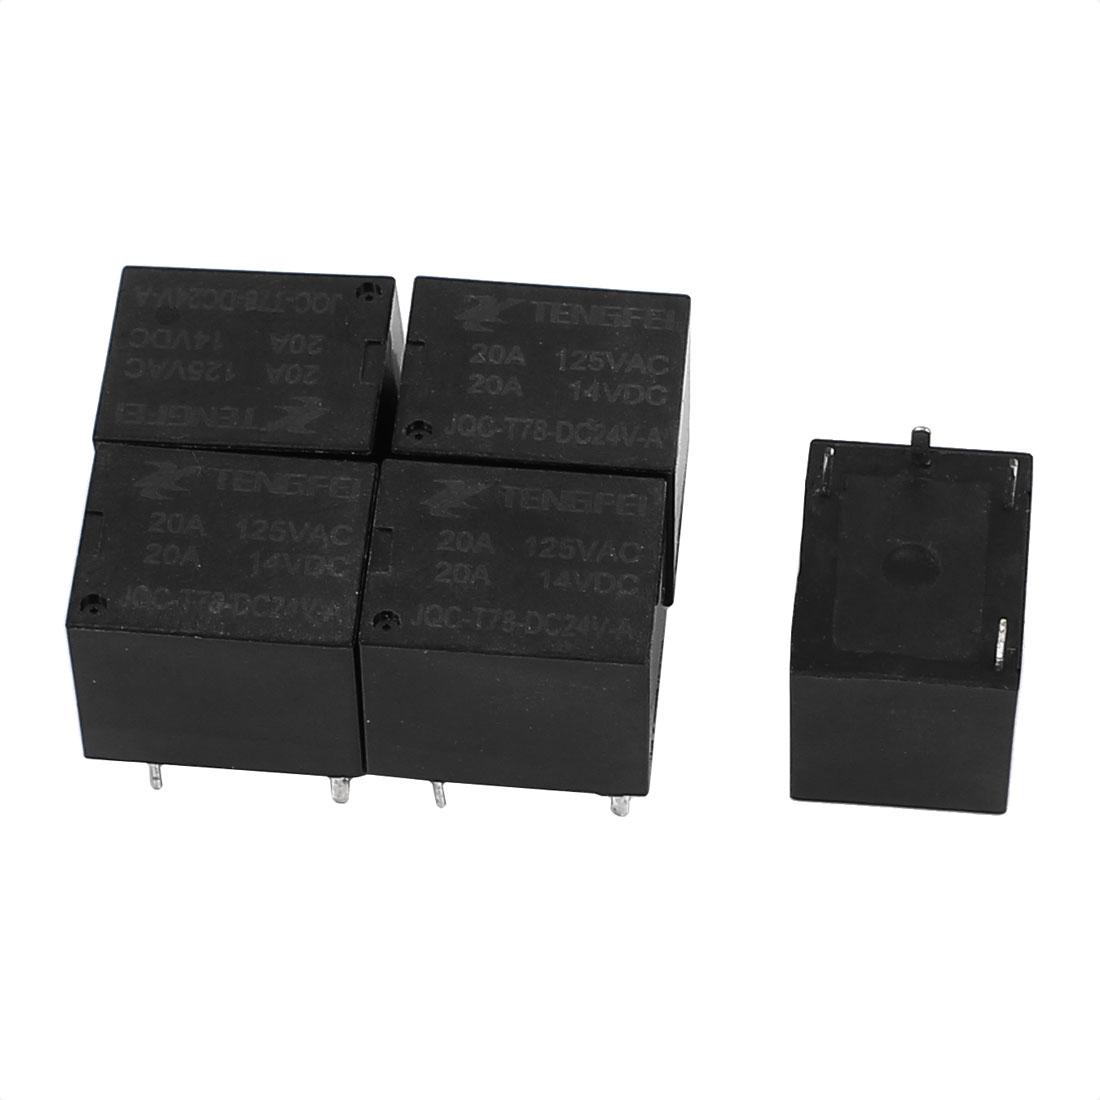 5Pcs DC24V 20A 0.6W 4 Terminal SPST NO Mini Power Coil Electromagnetic Relay